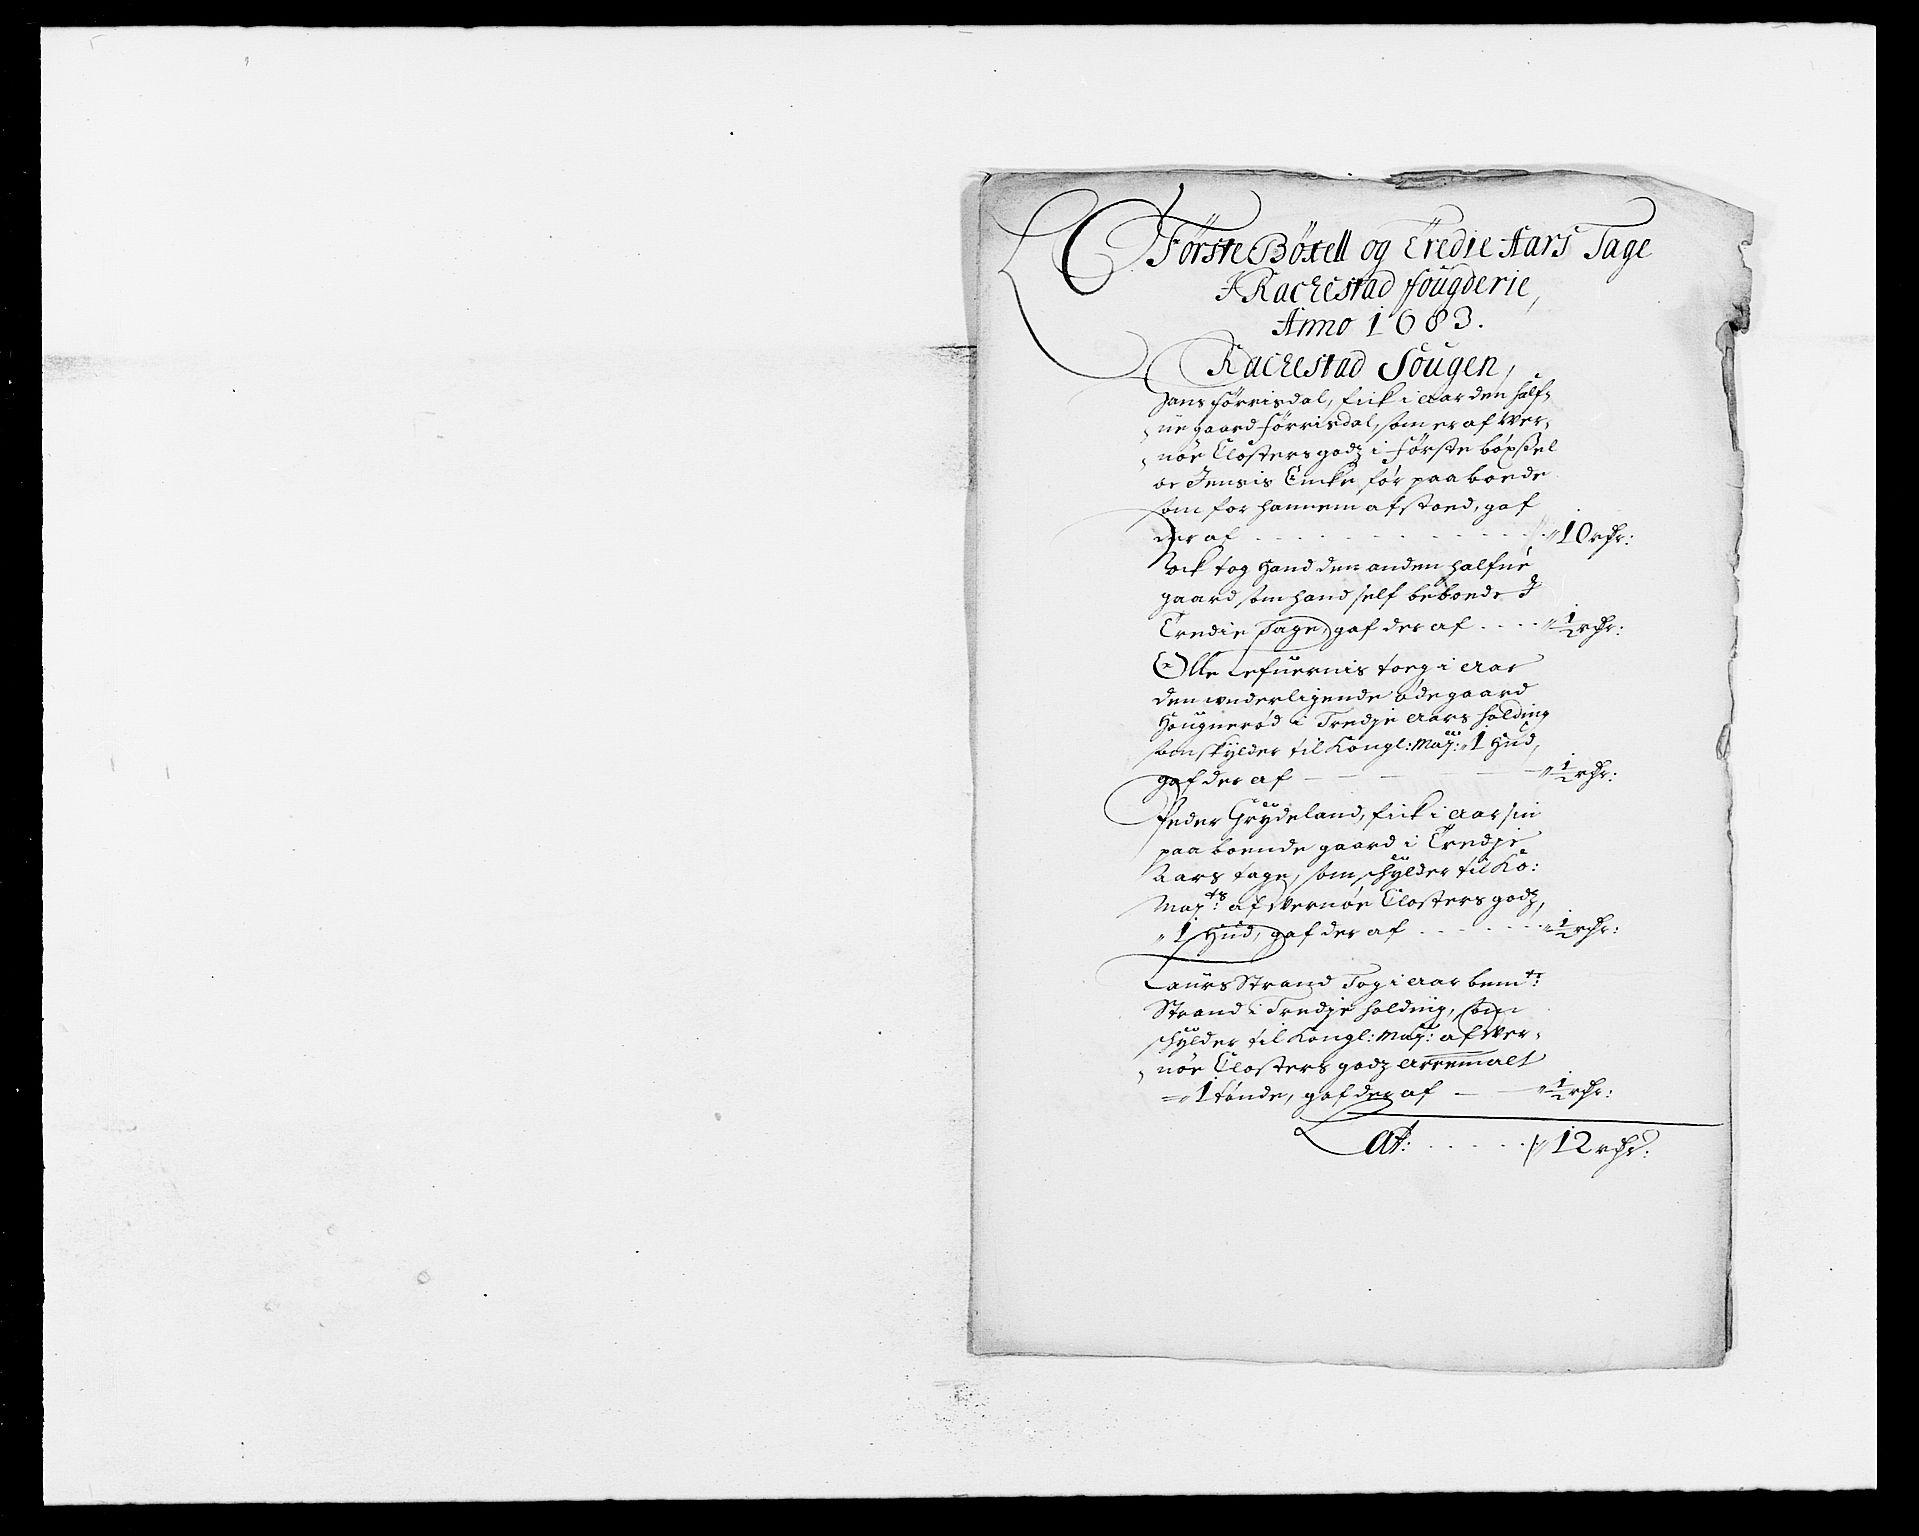 RA, Rentekammeret inntil 1814, Reviderte regnskaper, Fogderegnskap, R05/L0274: Fogderegnskap Rakkestad, 1683-1684, s. 43